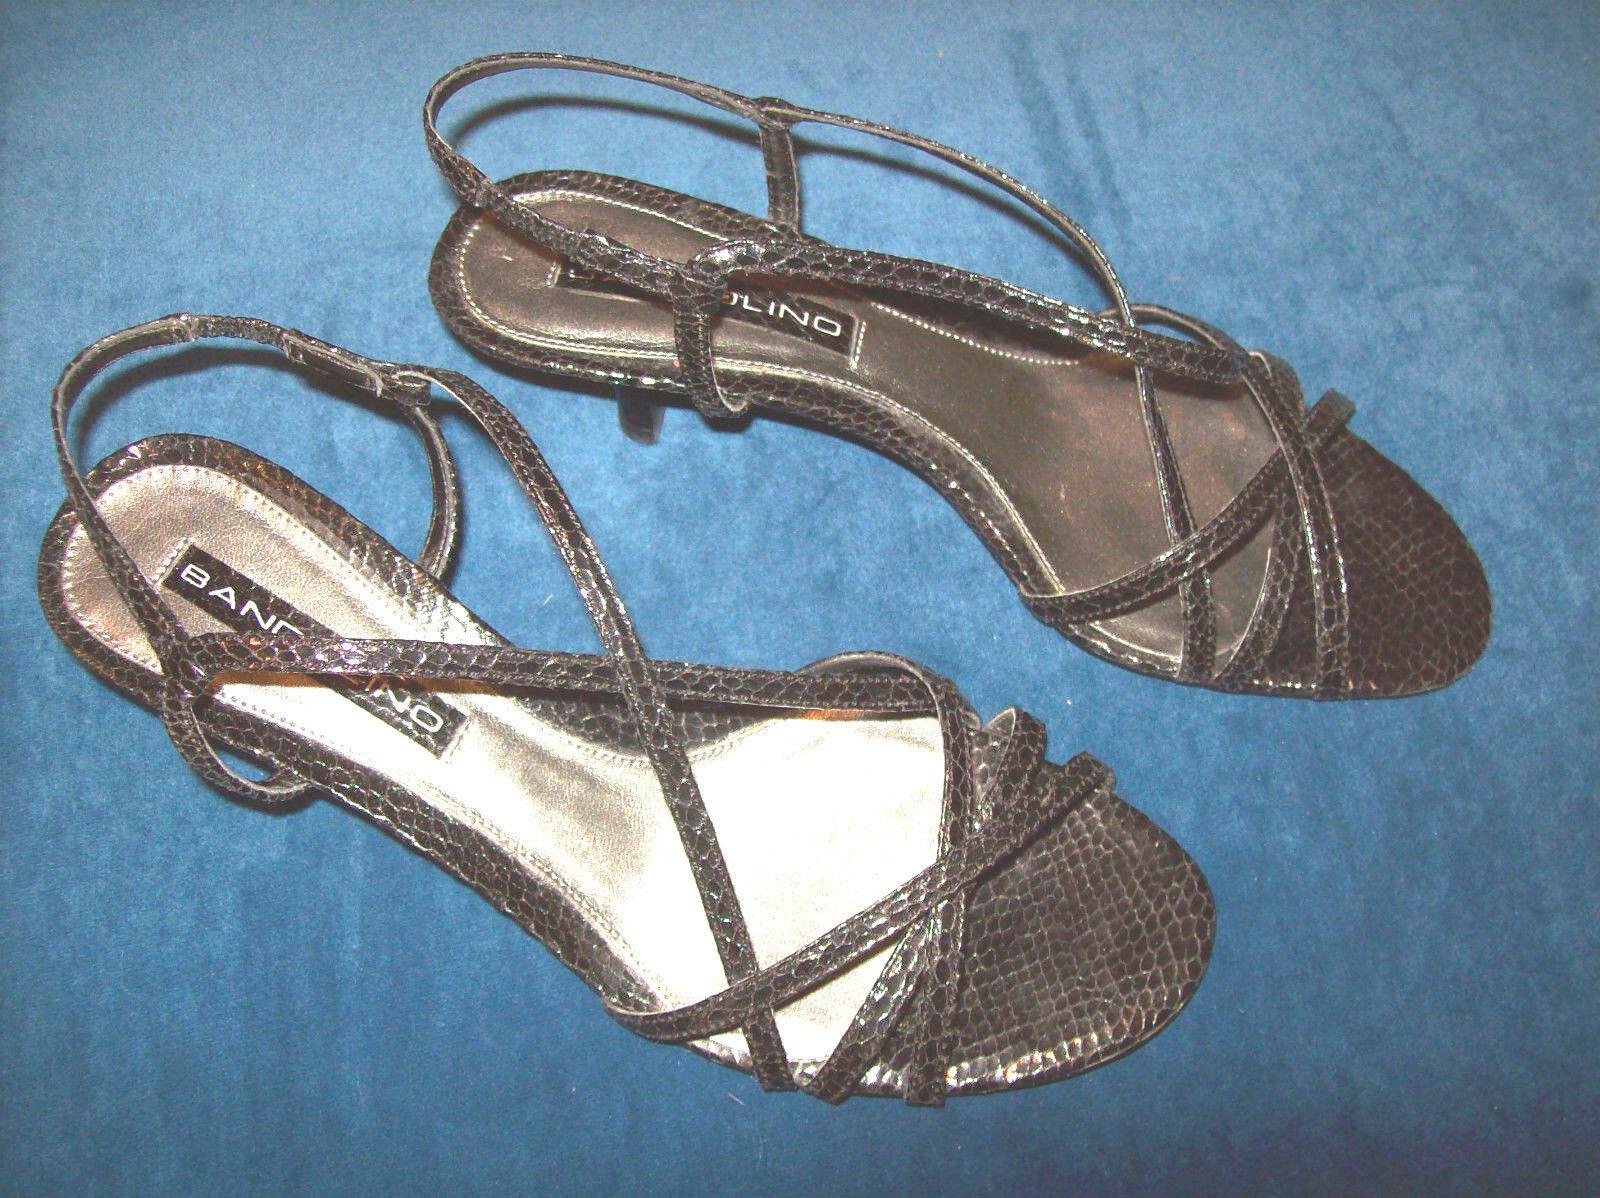 LADIES BANDOLINO BLACK SNAKESKIN DRESS SANDALS